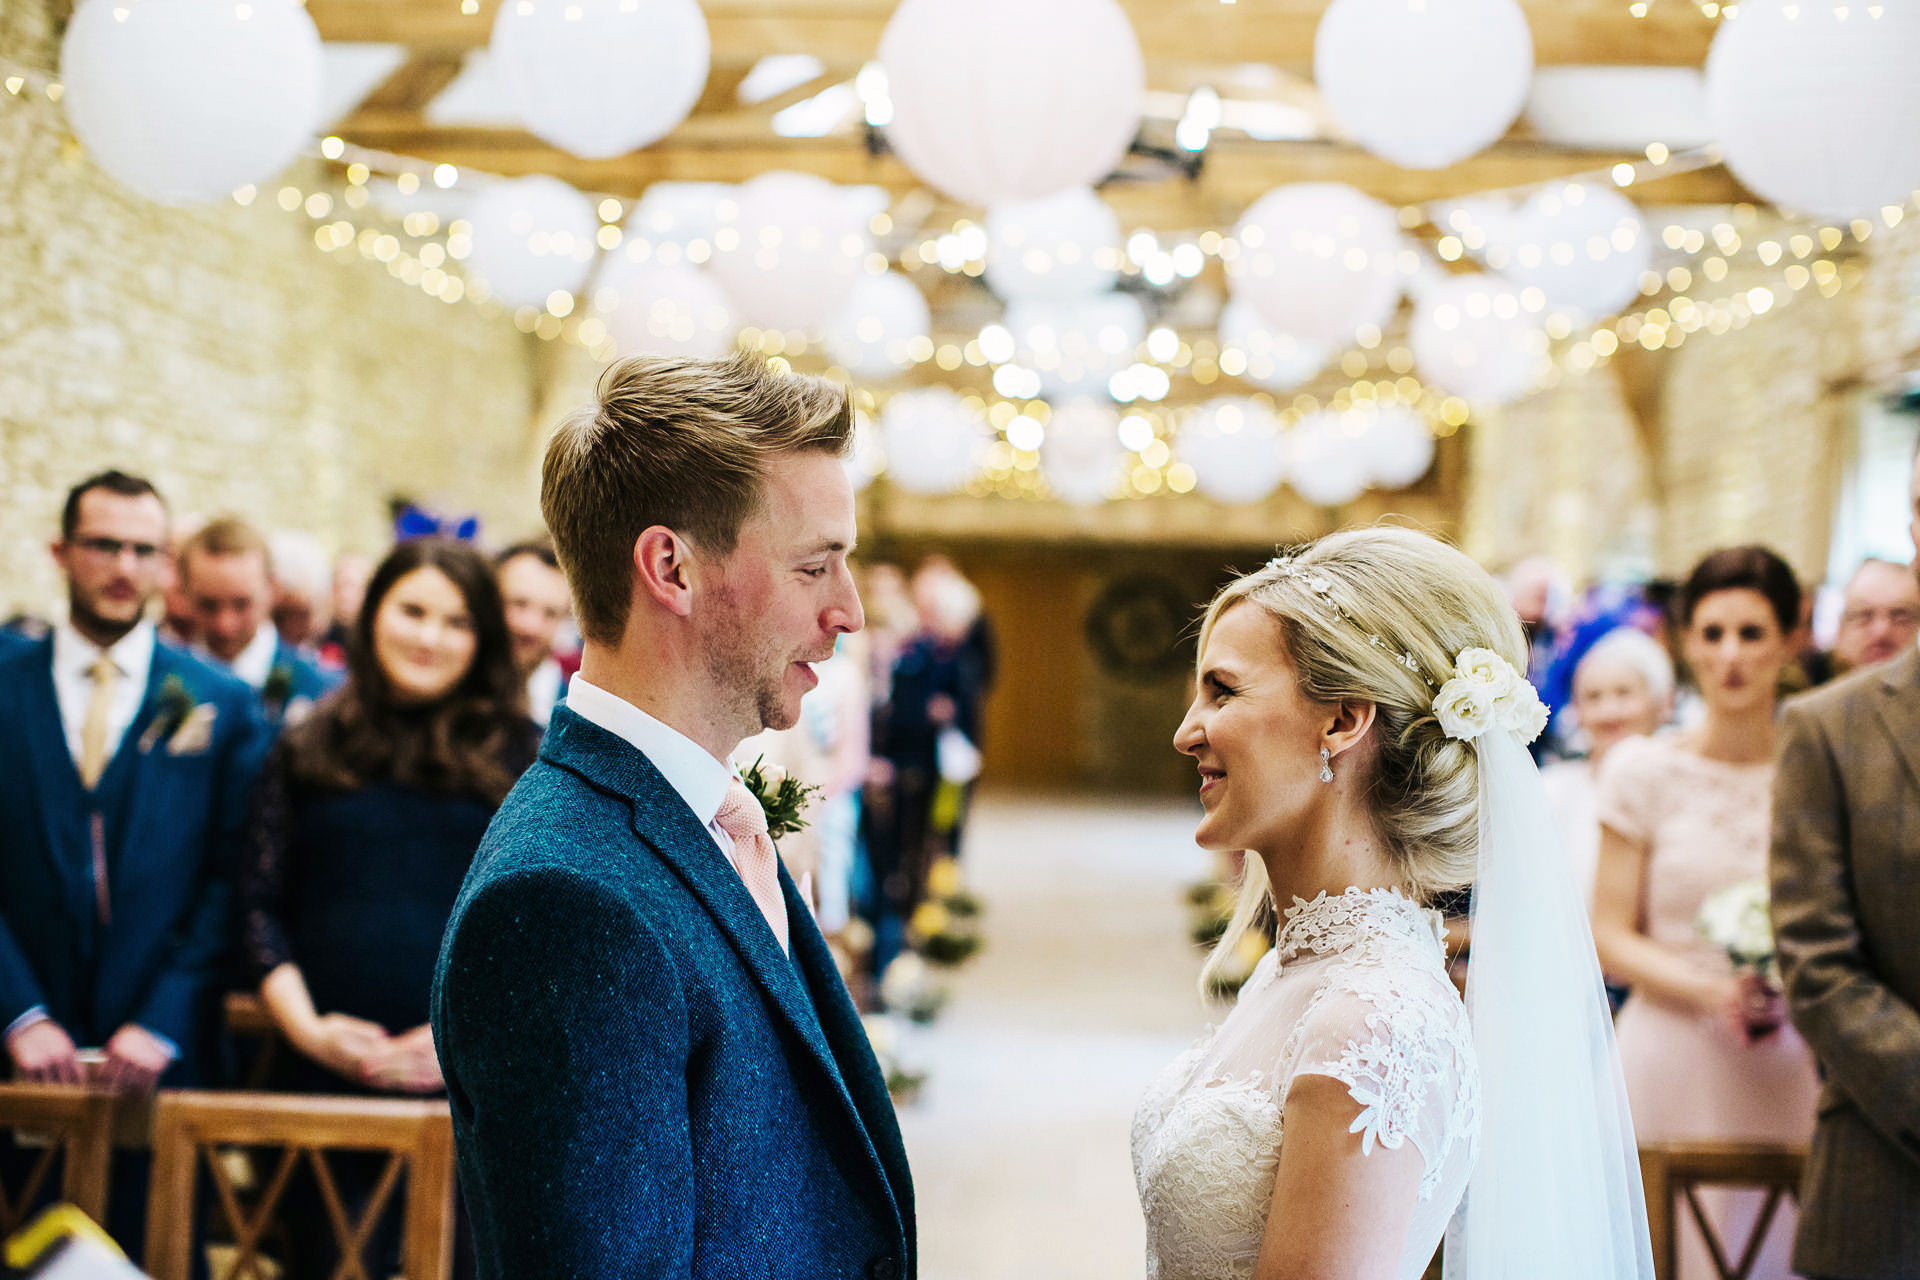 Caswell House Wedding Photographer - Jessica & Chris 12